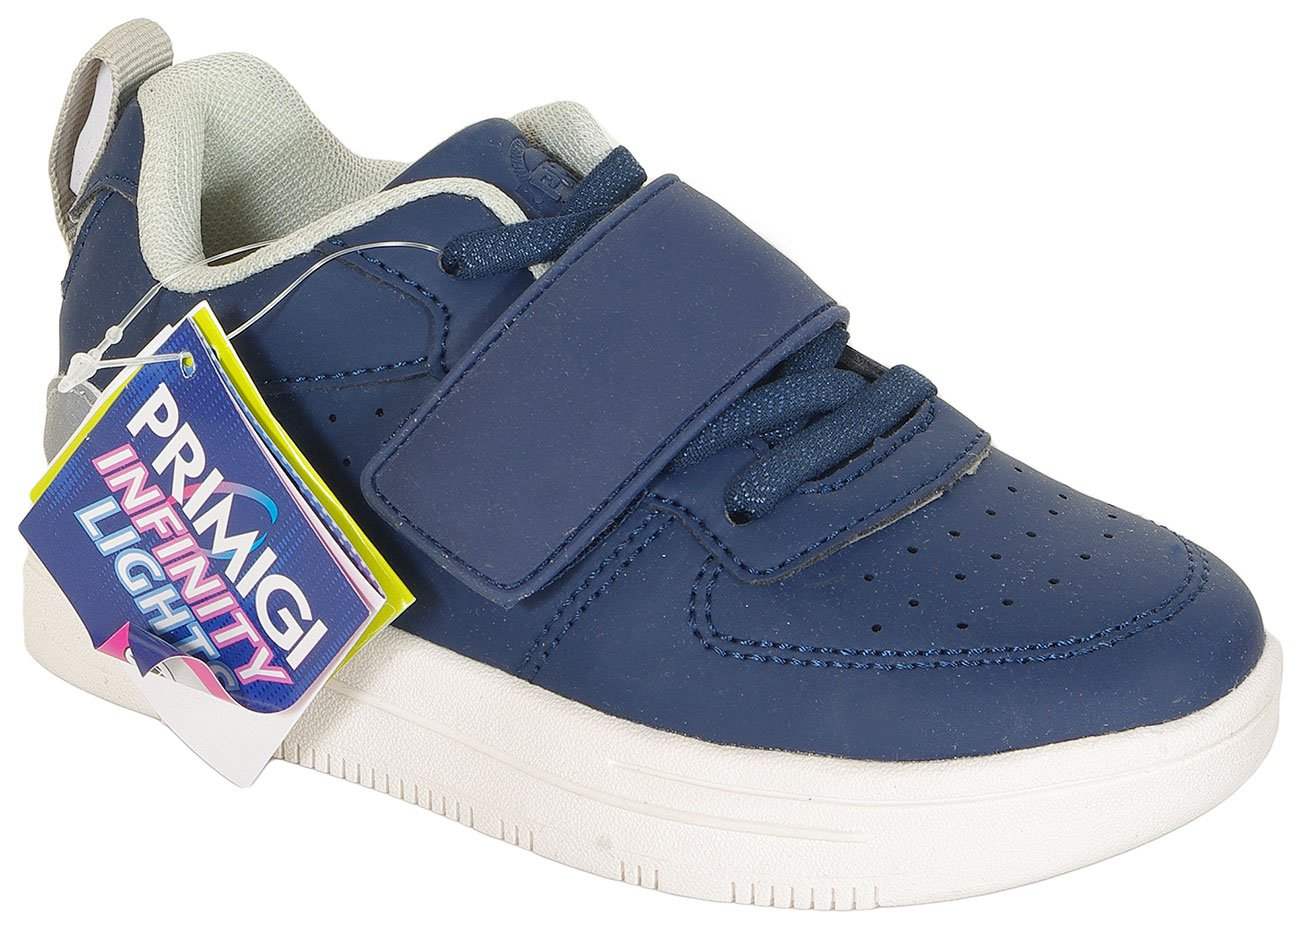 Primigi 44634 sneakers nappa navy